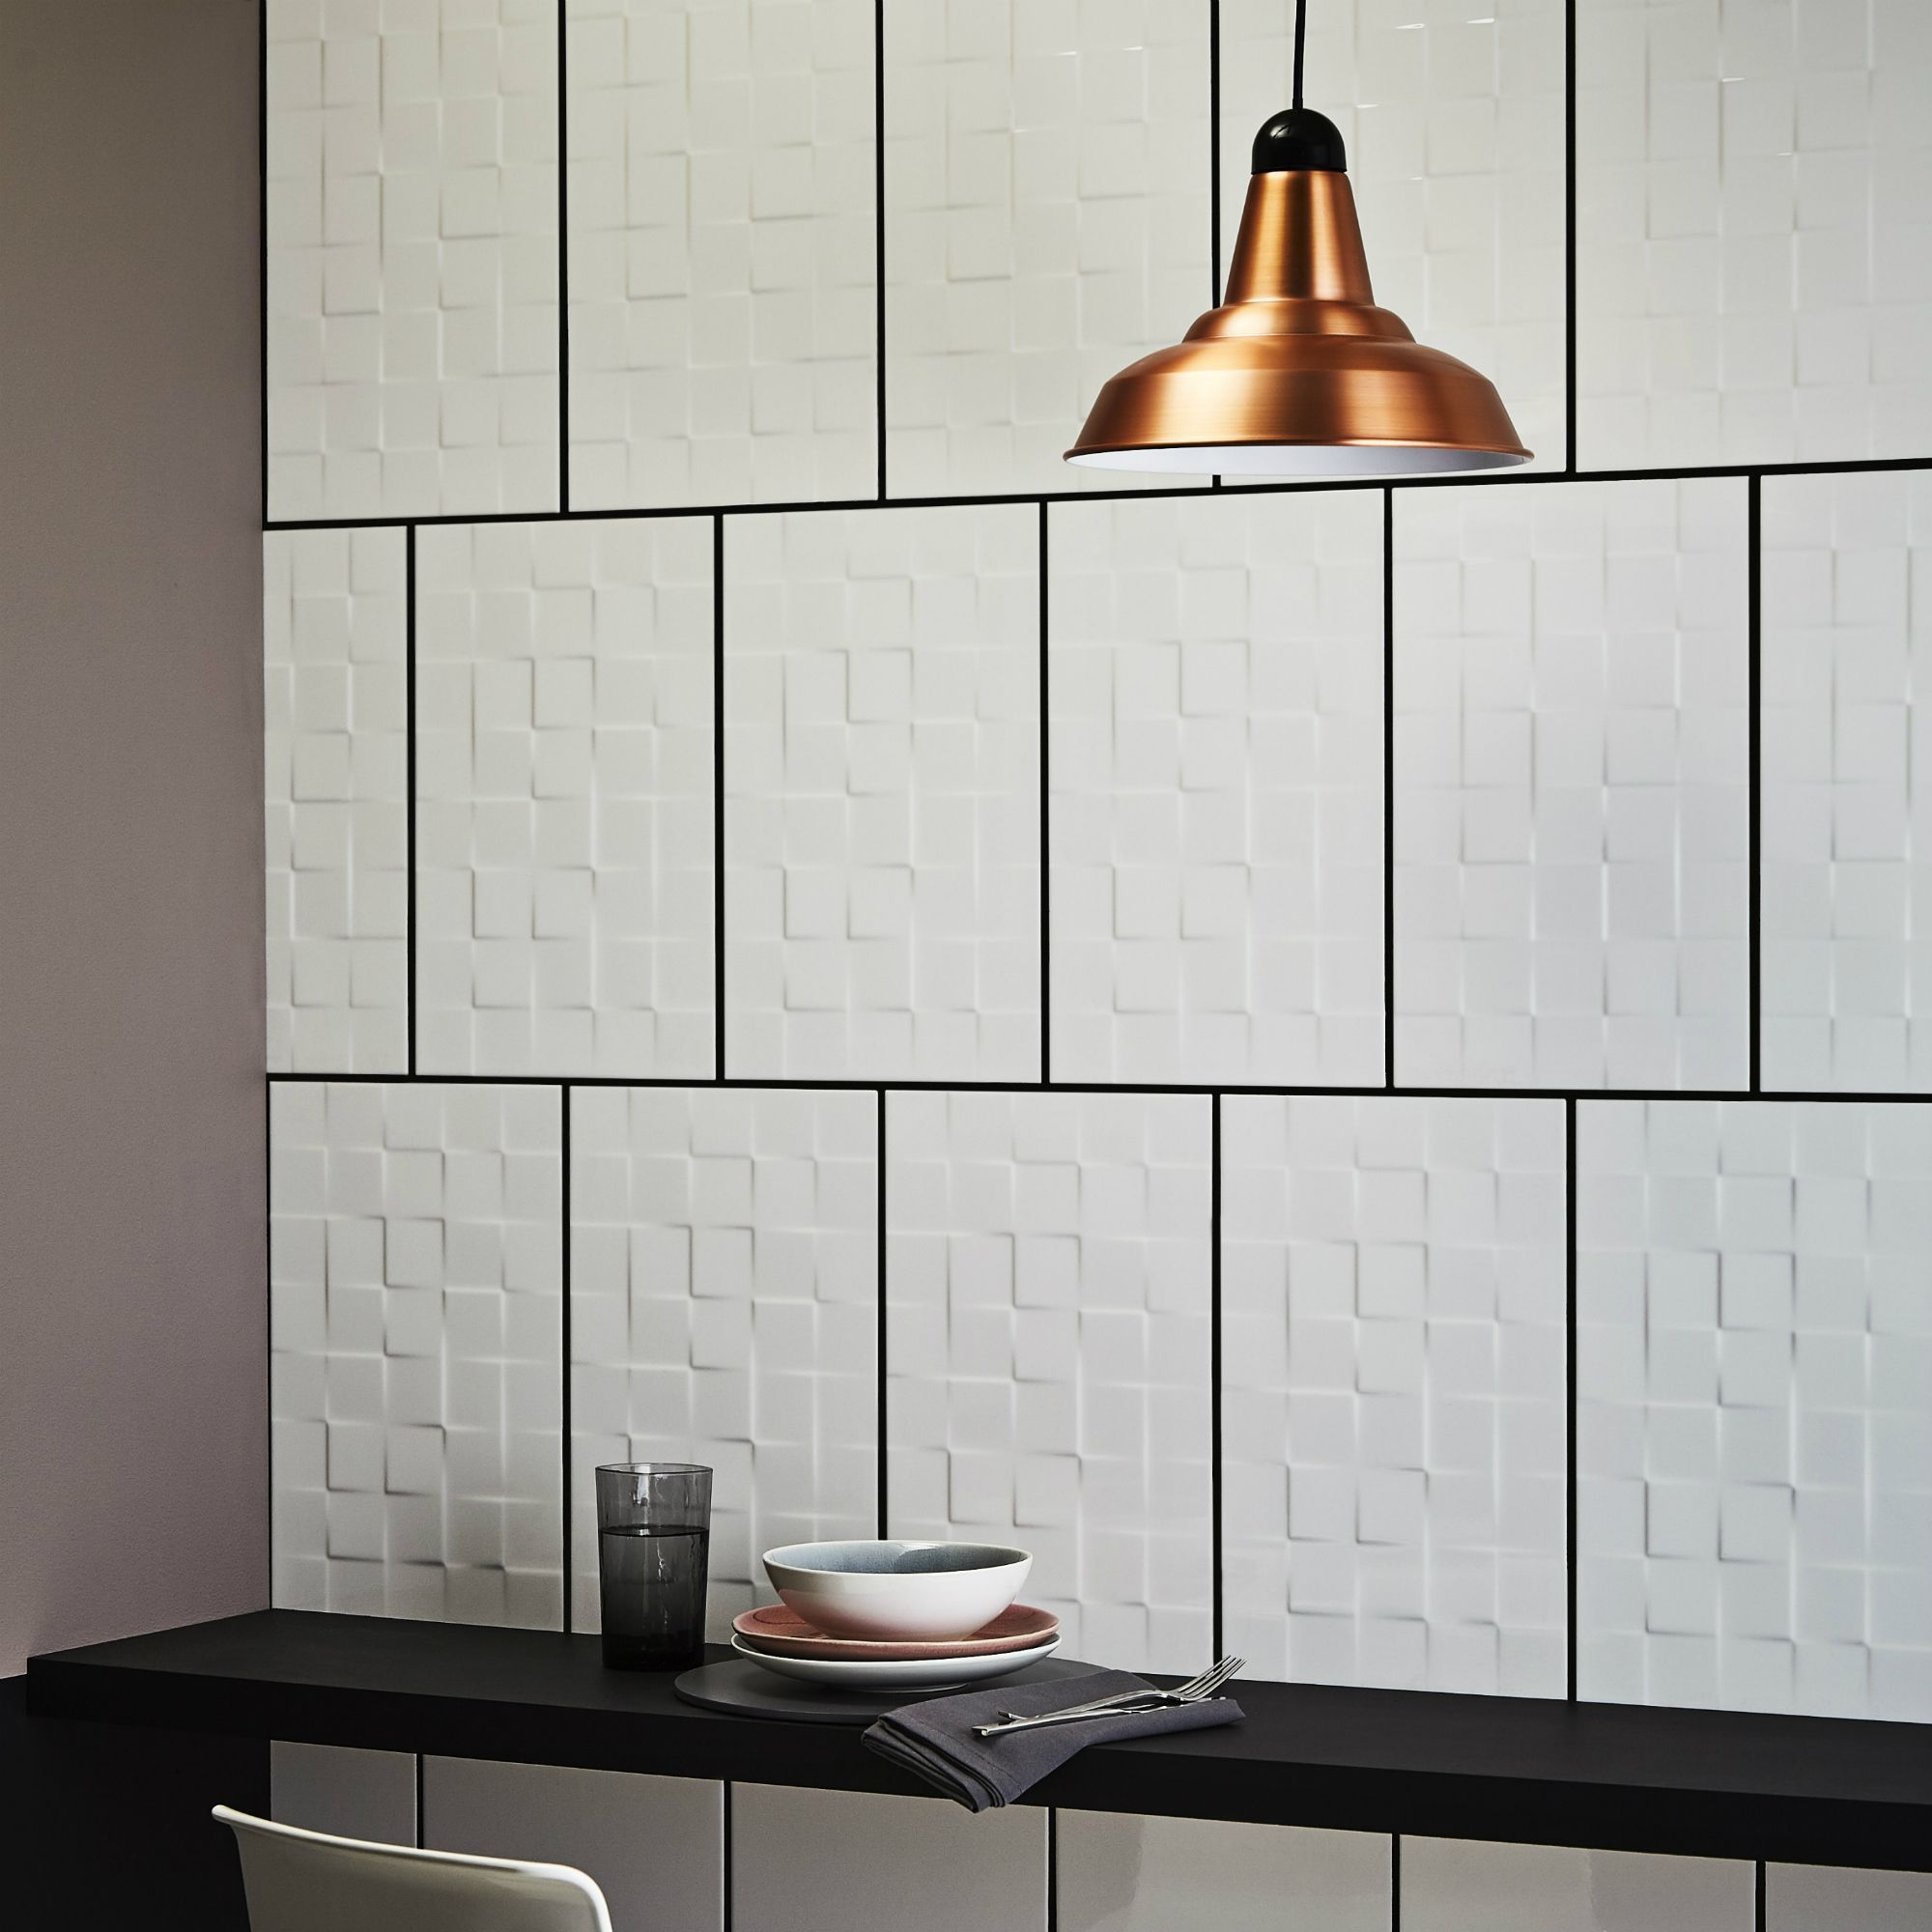 Alexandrina White Gloss Square Ceramic Wall Tile Sample Ceramic Wall Tiles Wall Tiles White Gloss